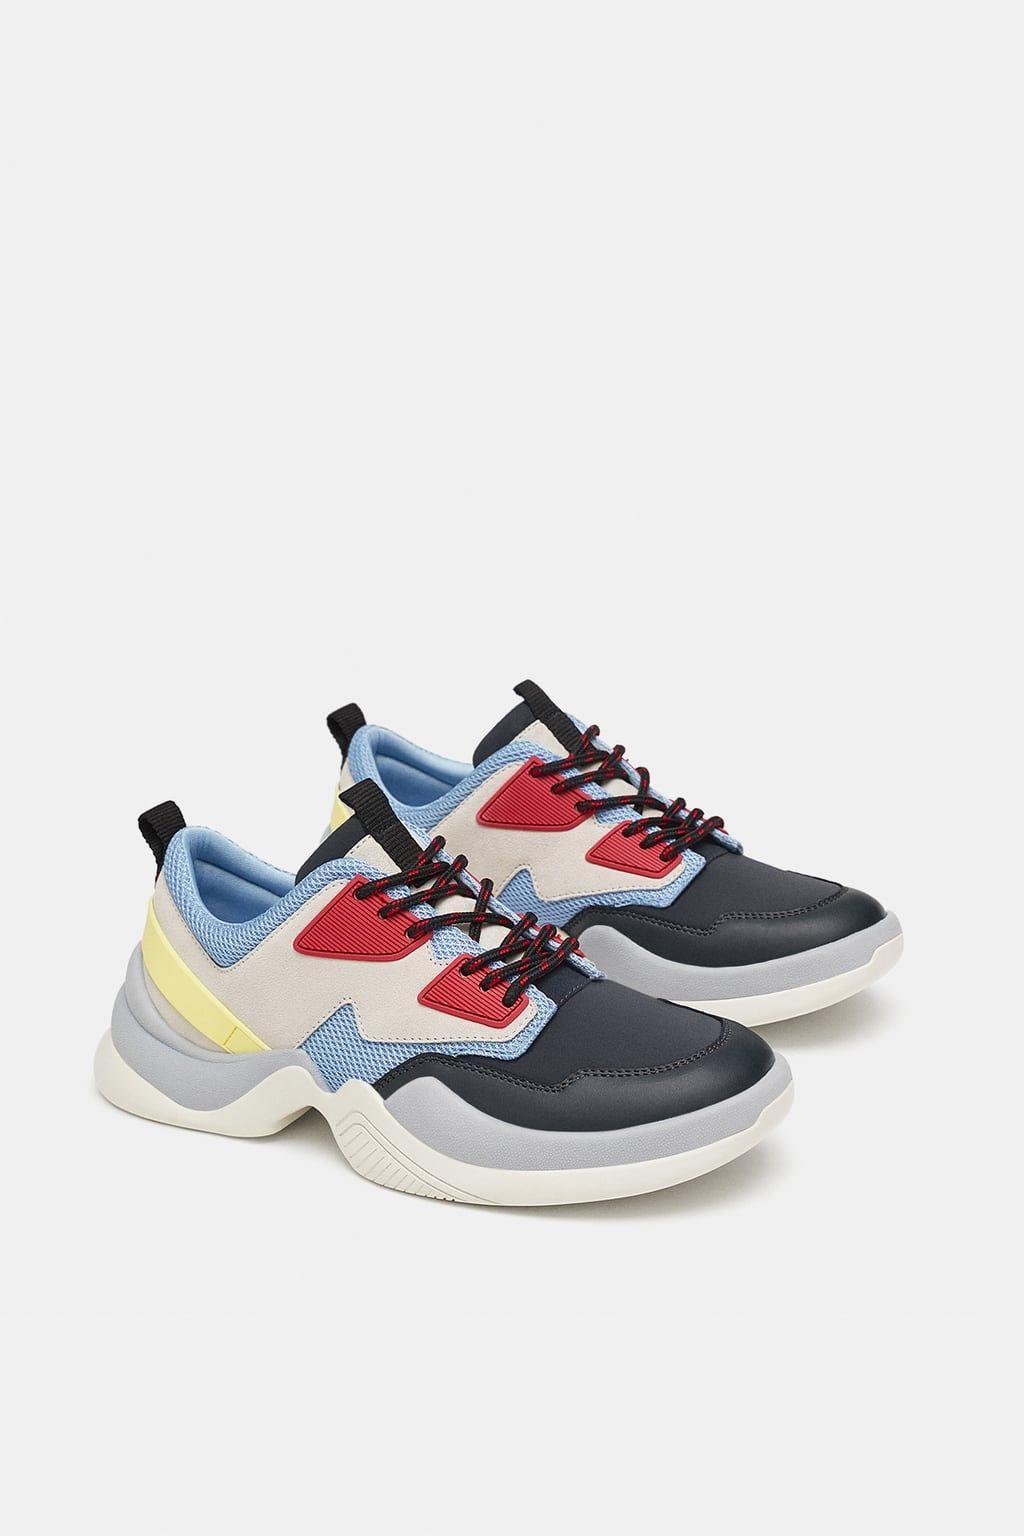 Zara | Sneakers fashion, Sneakers, Fashion